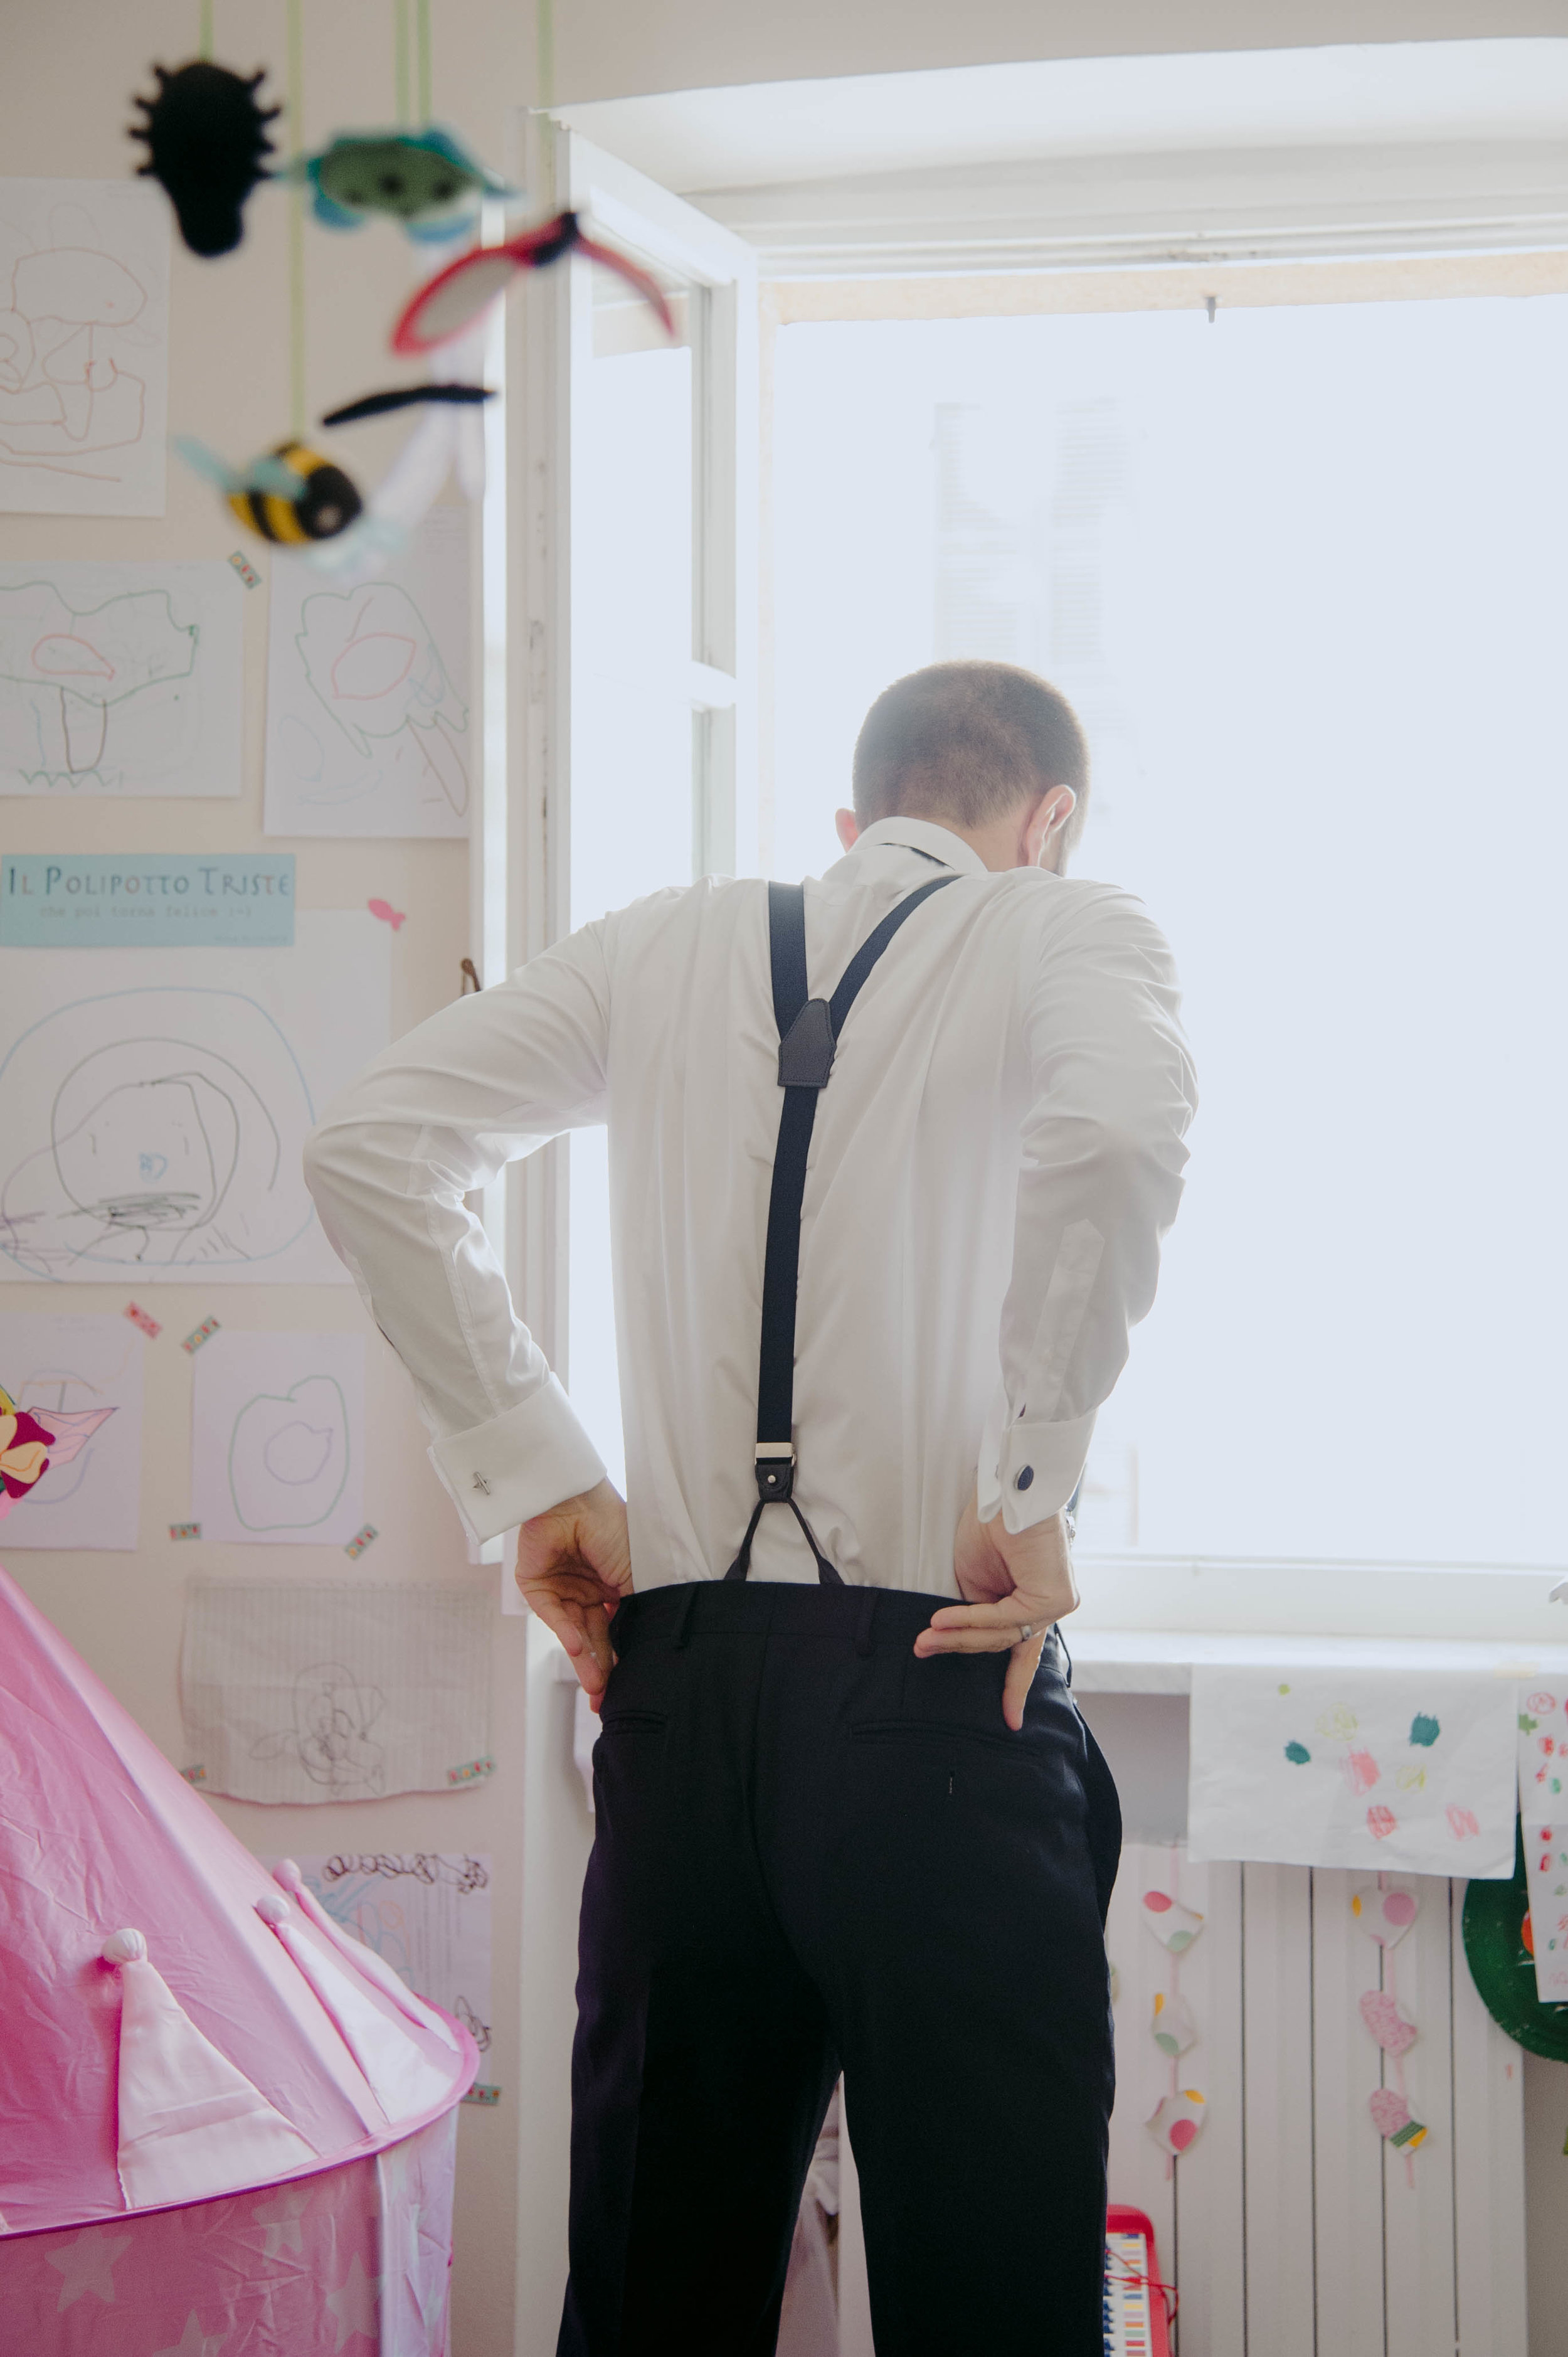 075 - Preparazione sposi.jpg